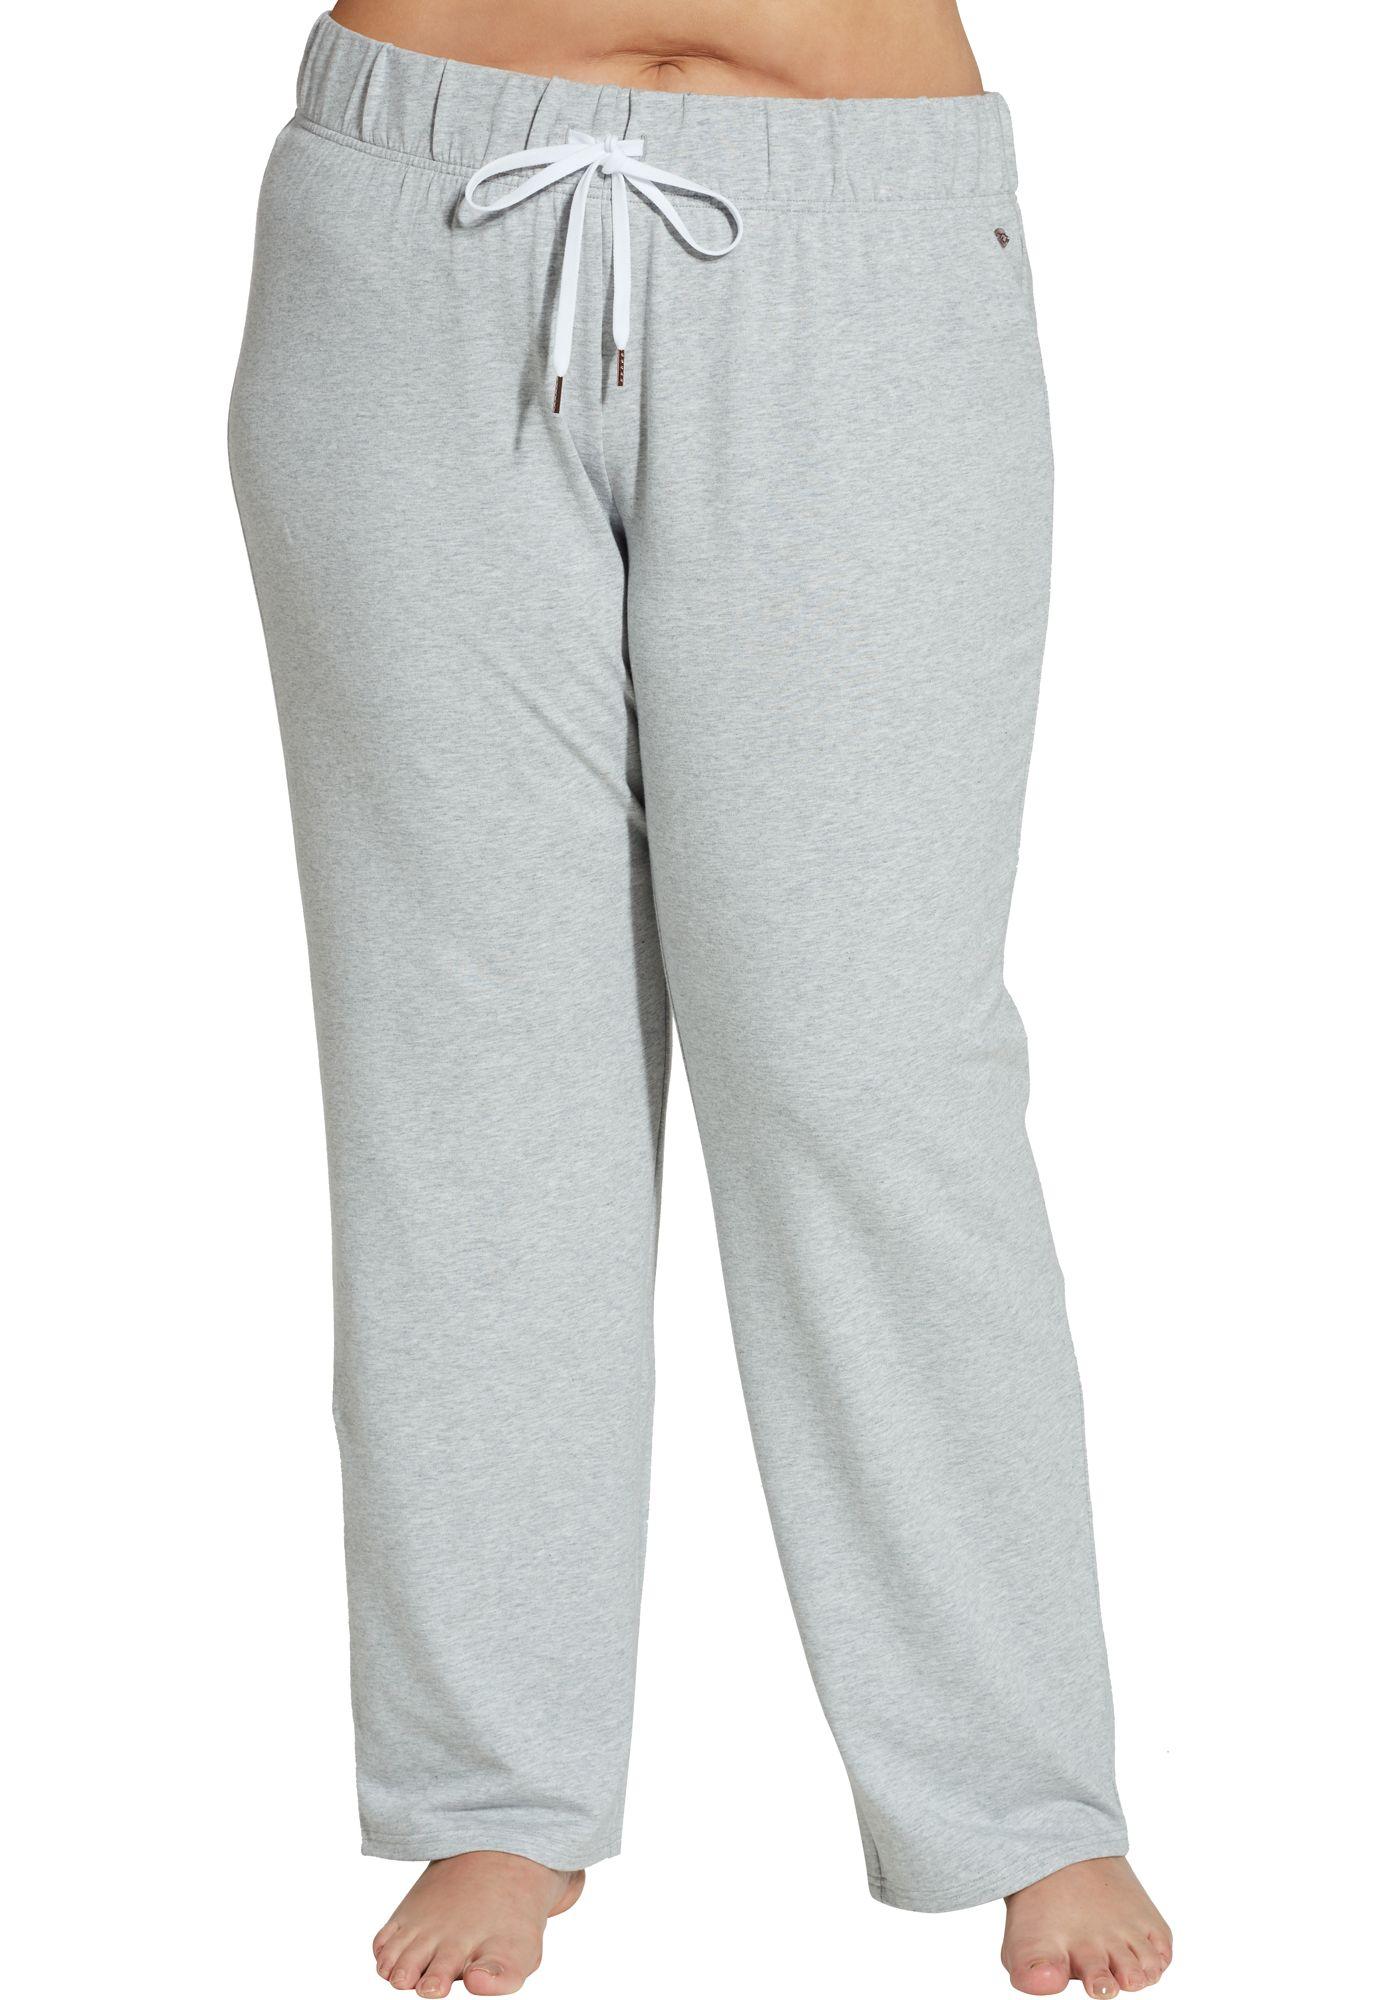 CALIA by Carrie Underwood Women's Plus Size Effortless Drawstring Pants